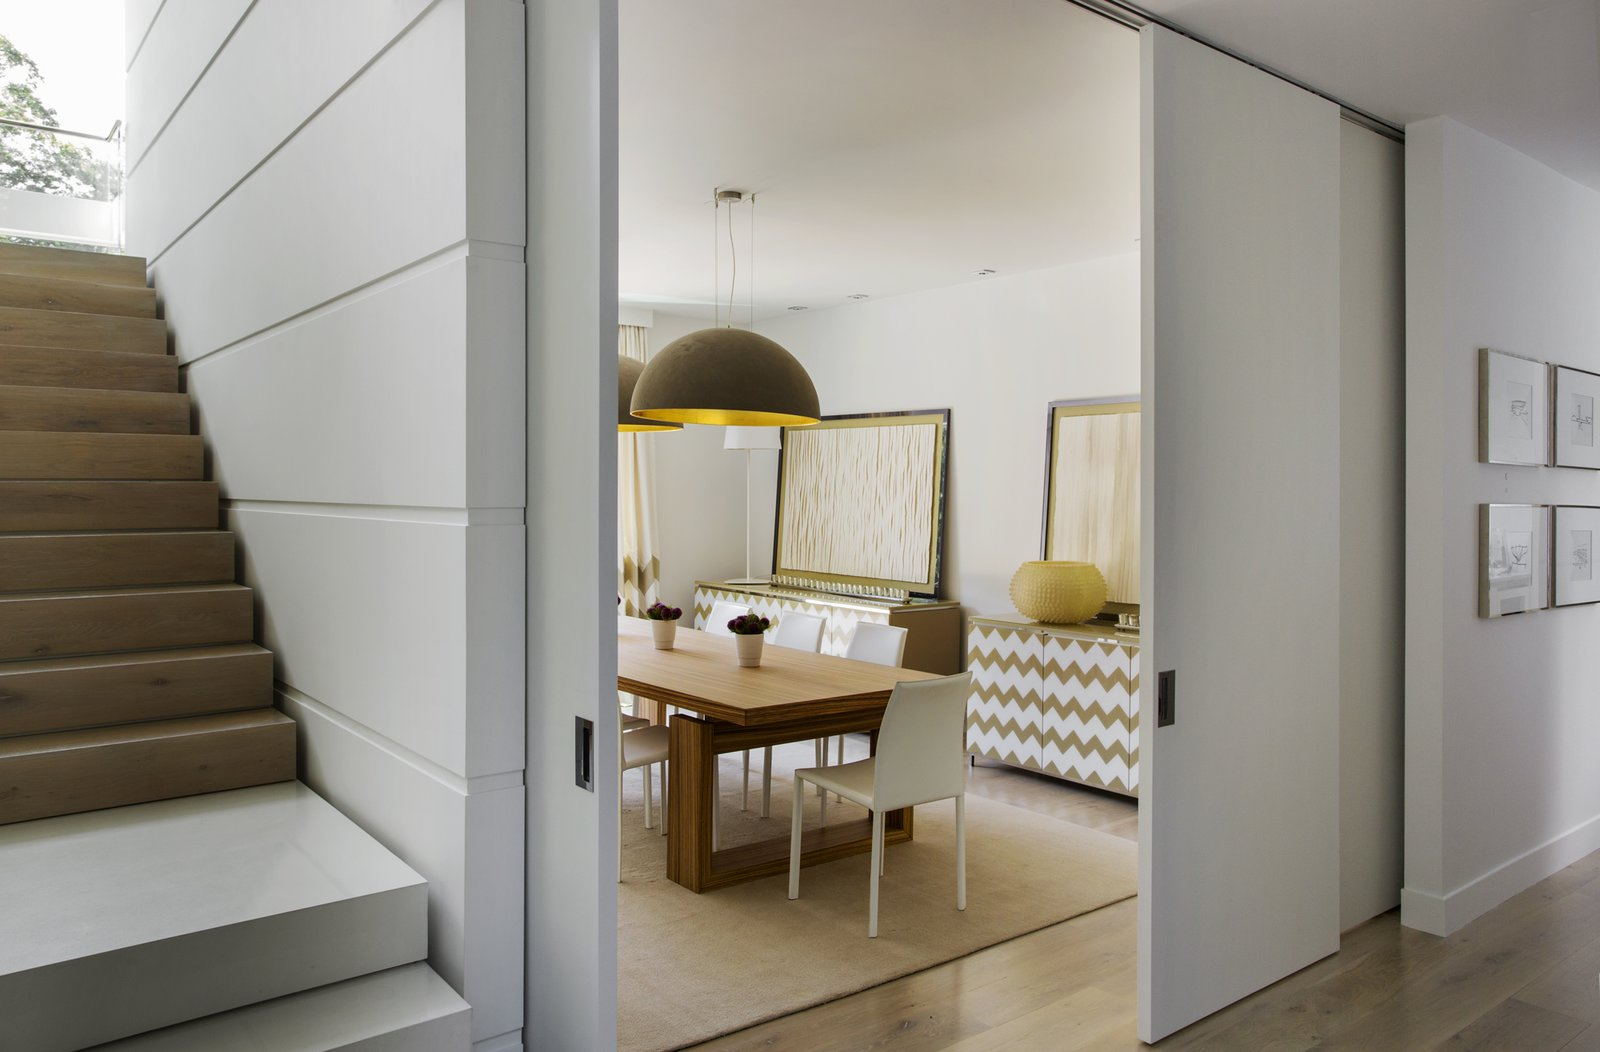 Ledgewood- Dining Room  Ledgewood by LDa  Architecture & Interiors